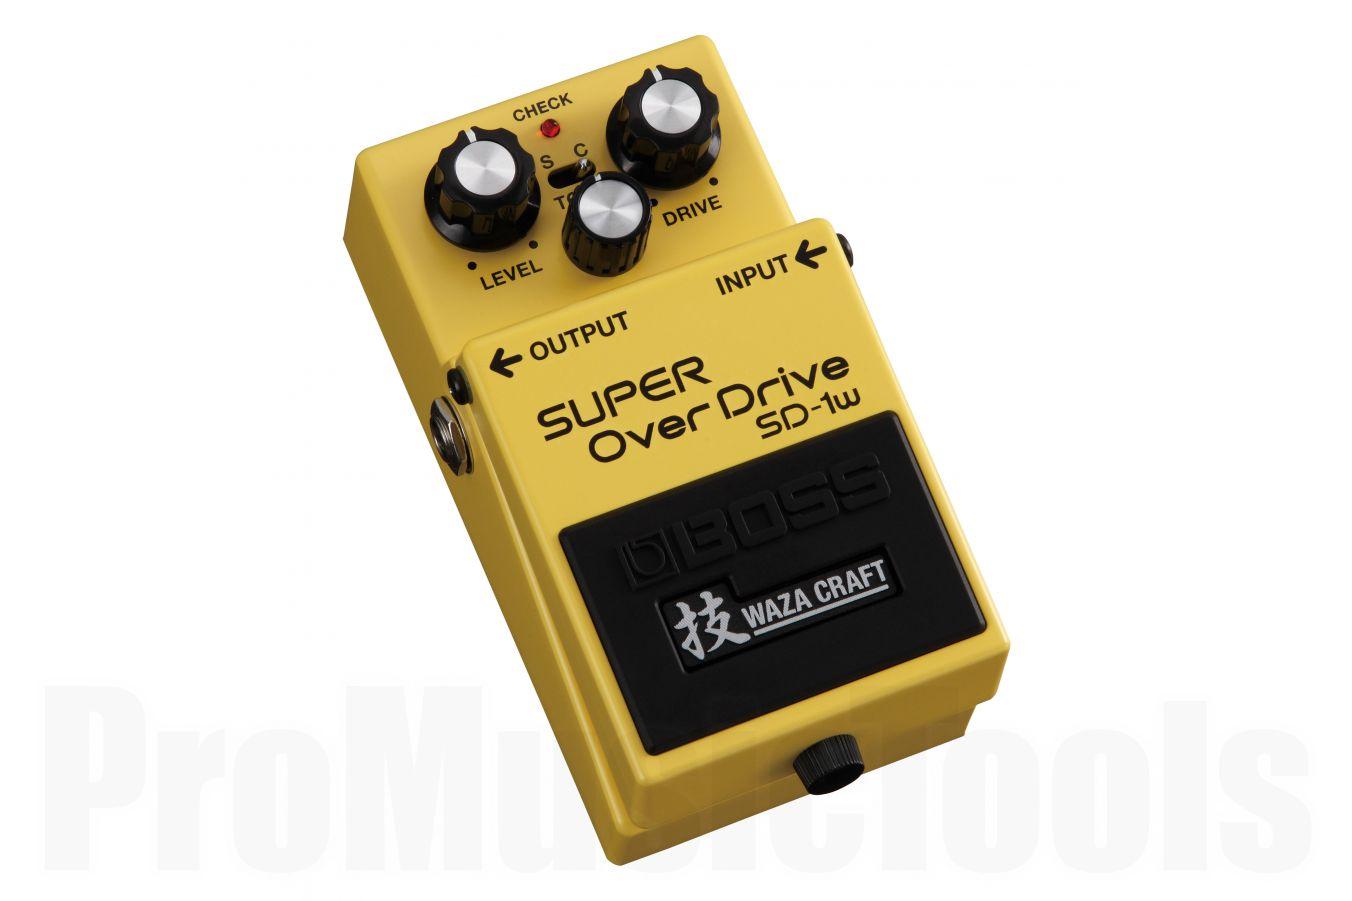 Boss SD-1w Super OverDrive - Waza Craft